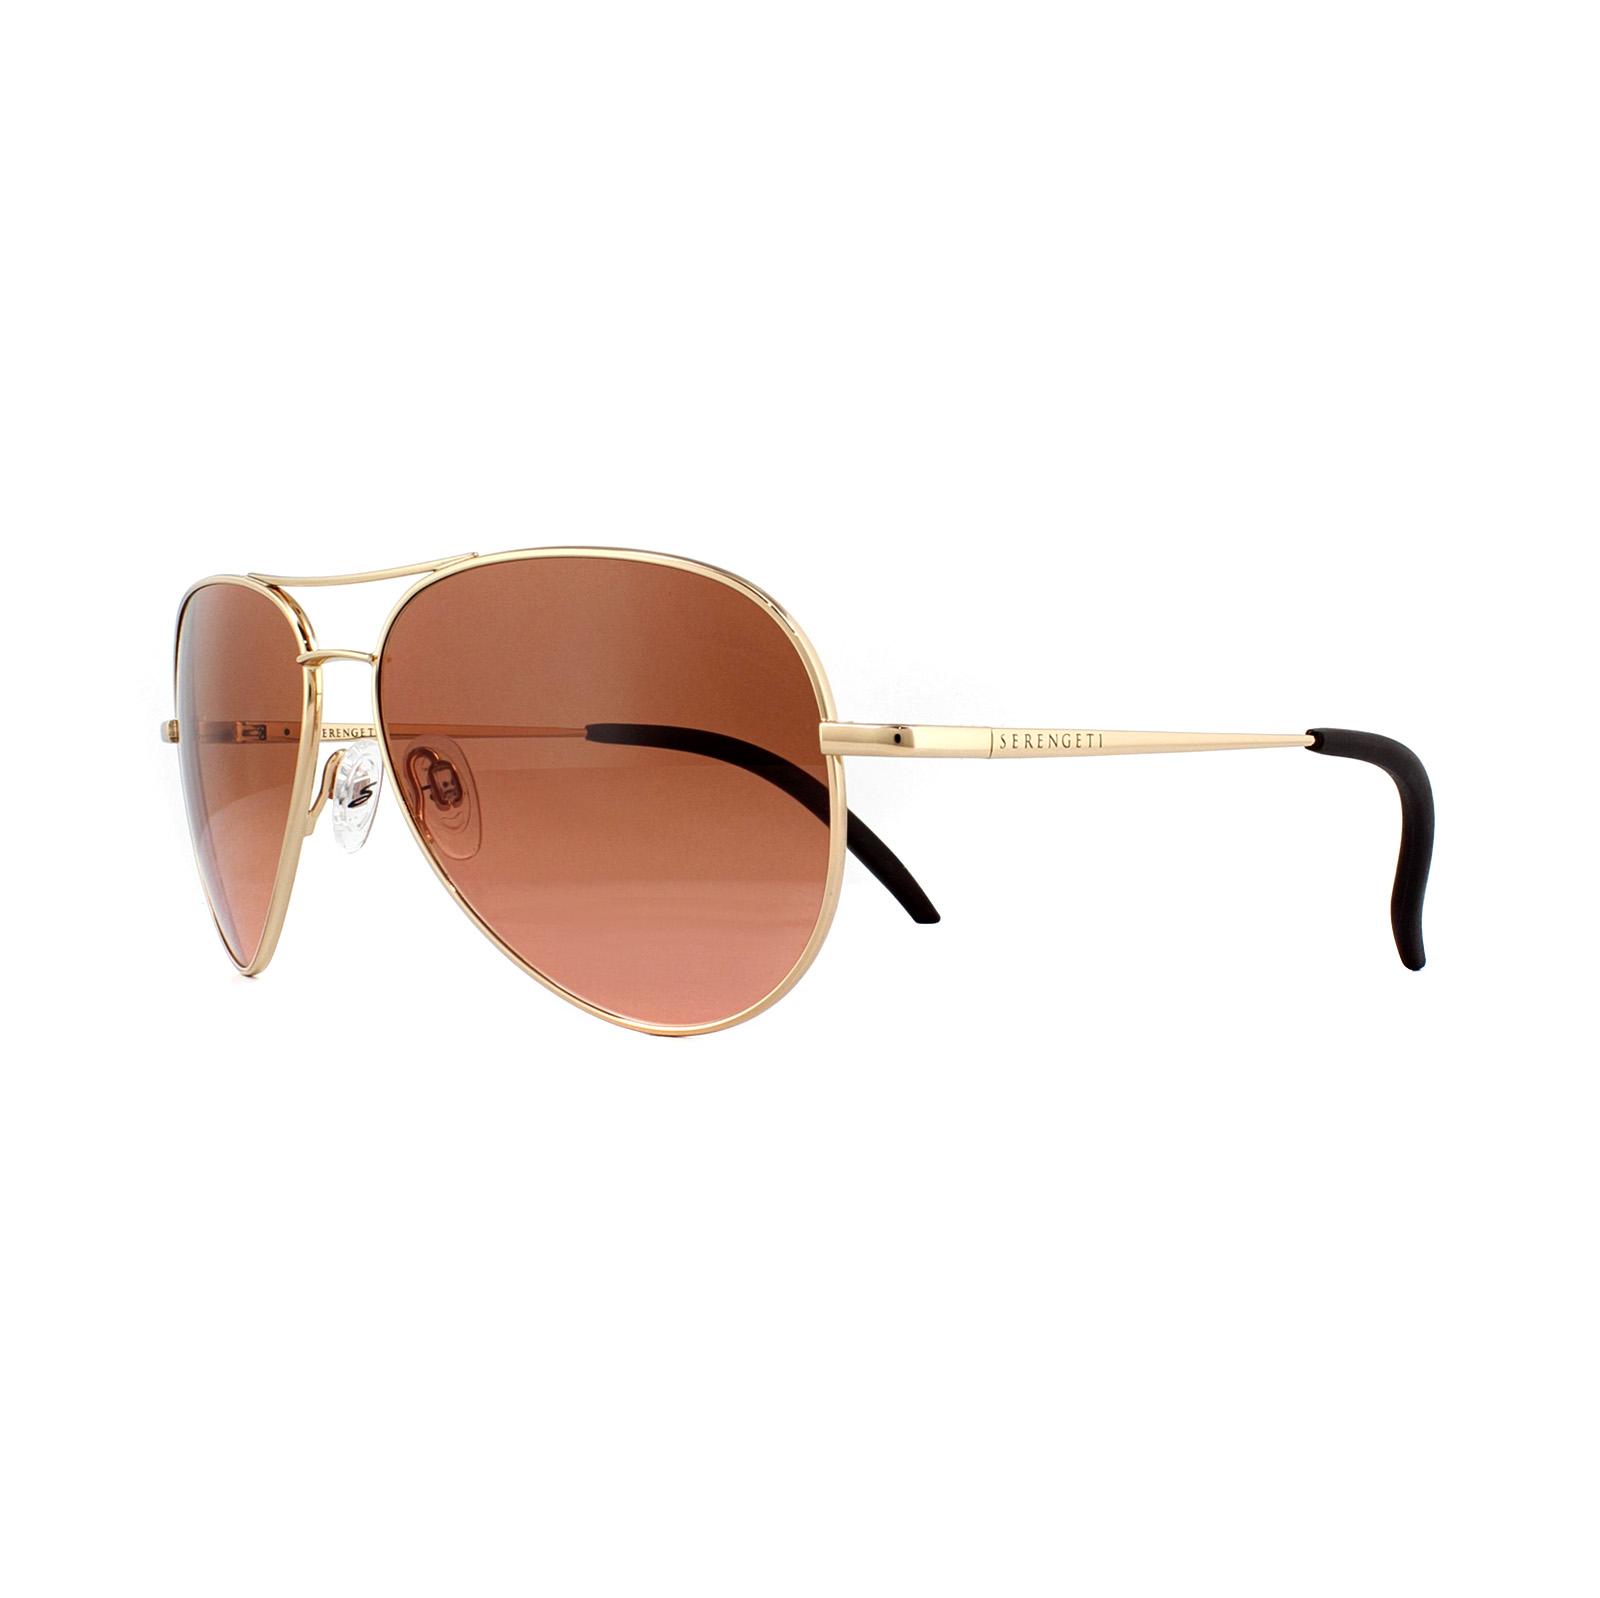 11c0beba90 Sentinel Serengeti Sunglasses Carrara Small 8550 Shiny Gold Drivers Brown  Gradient